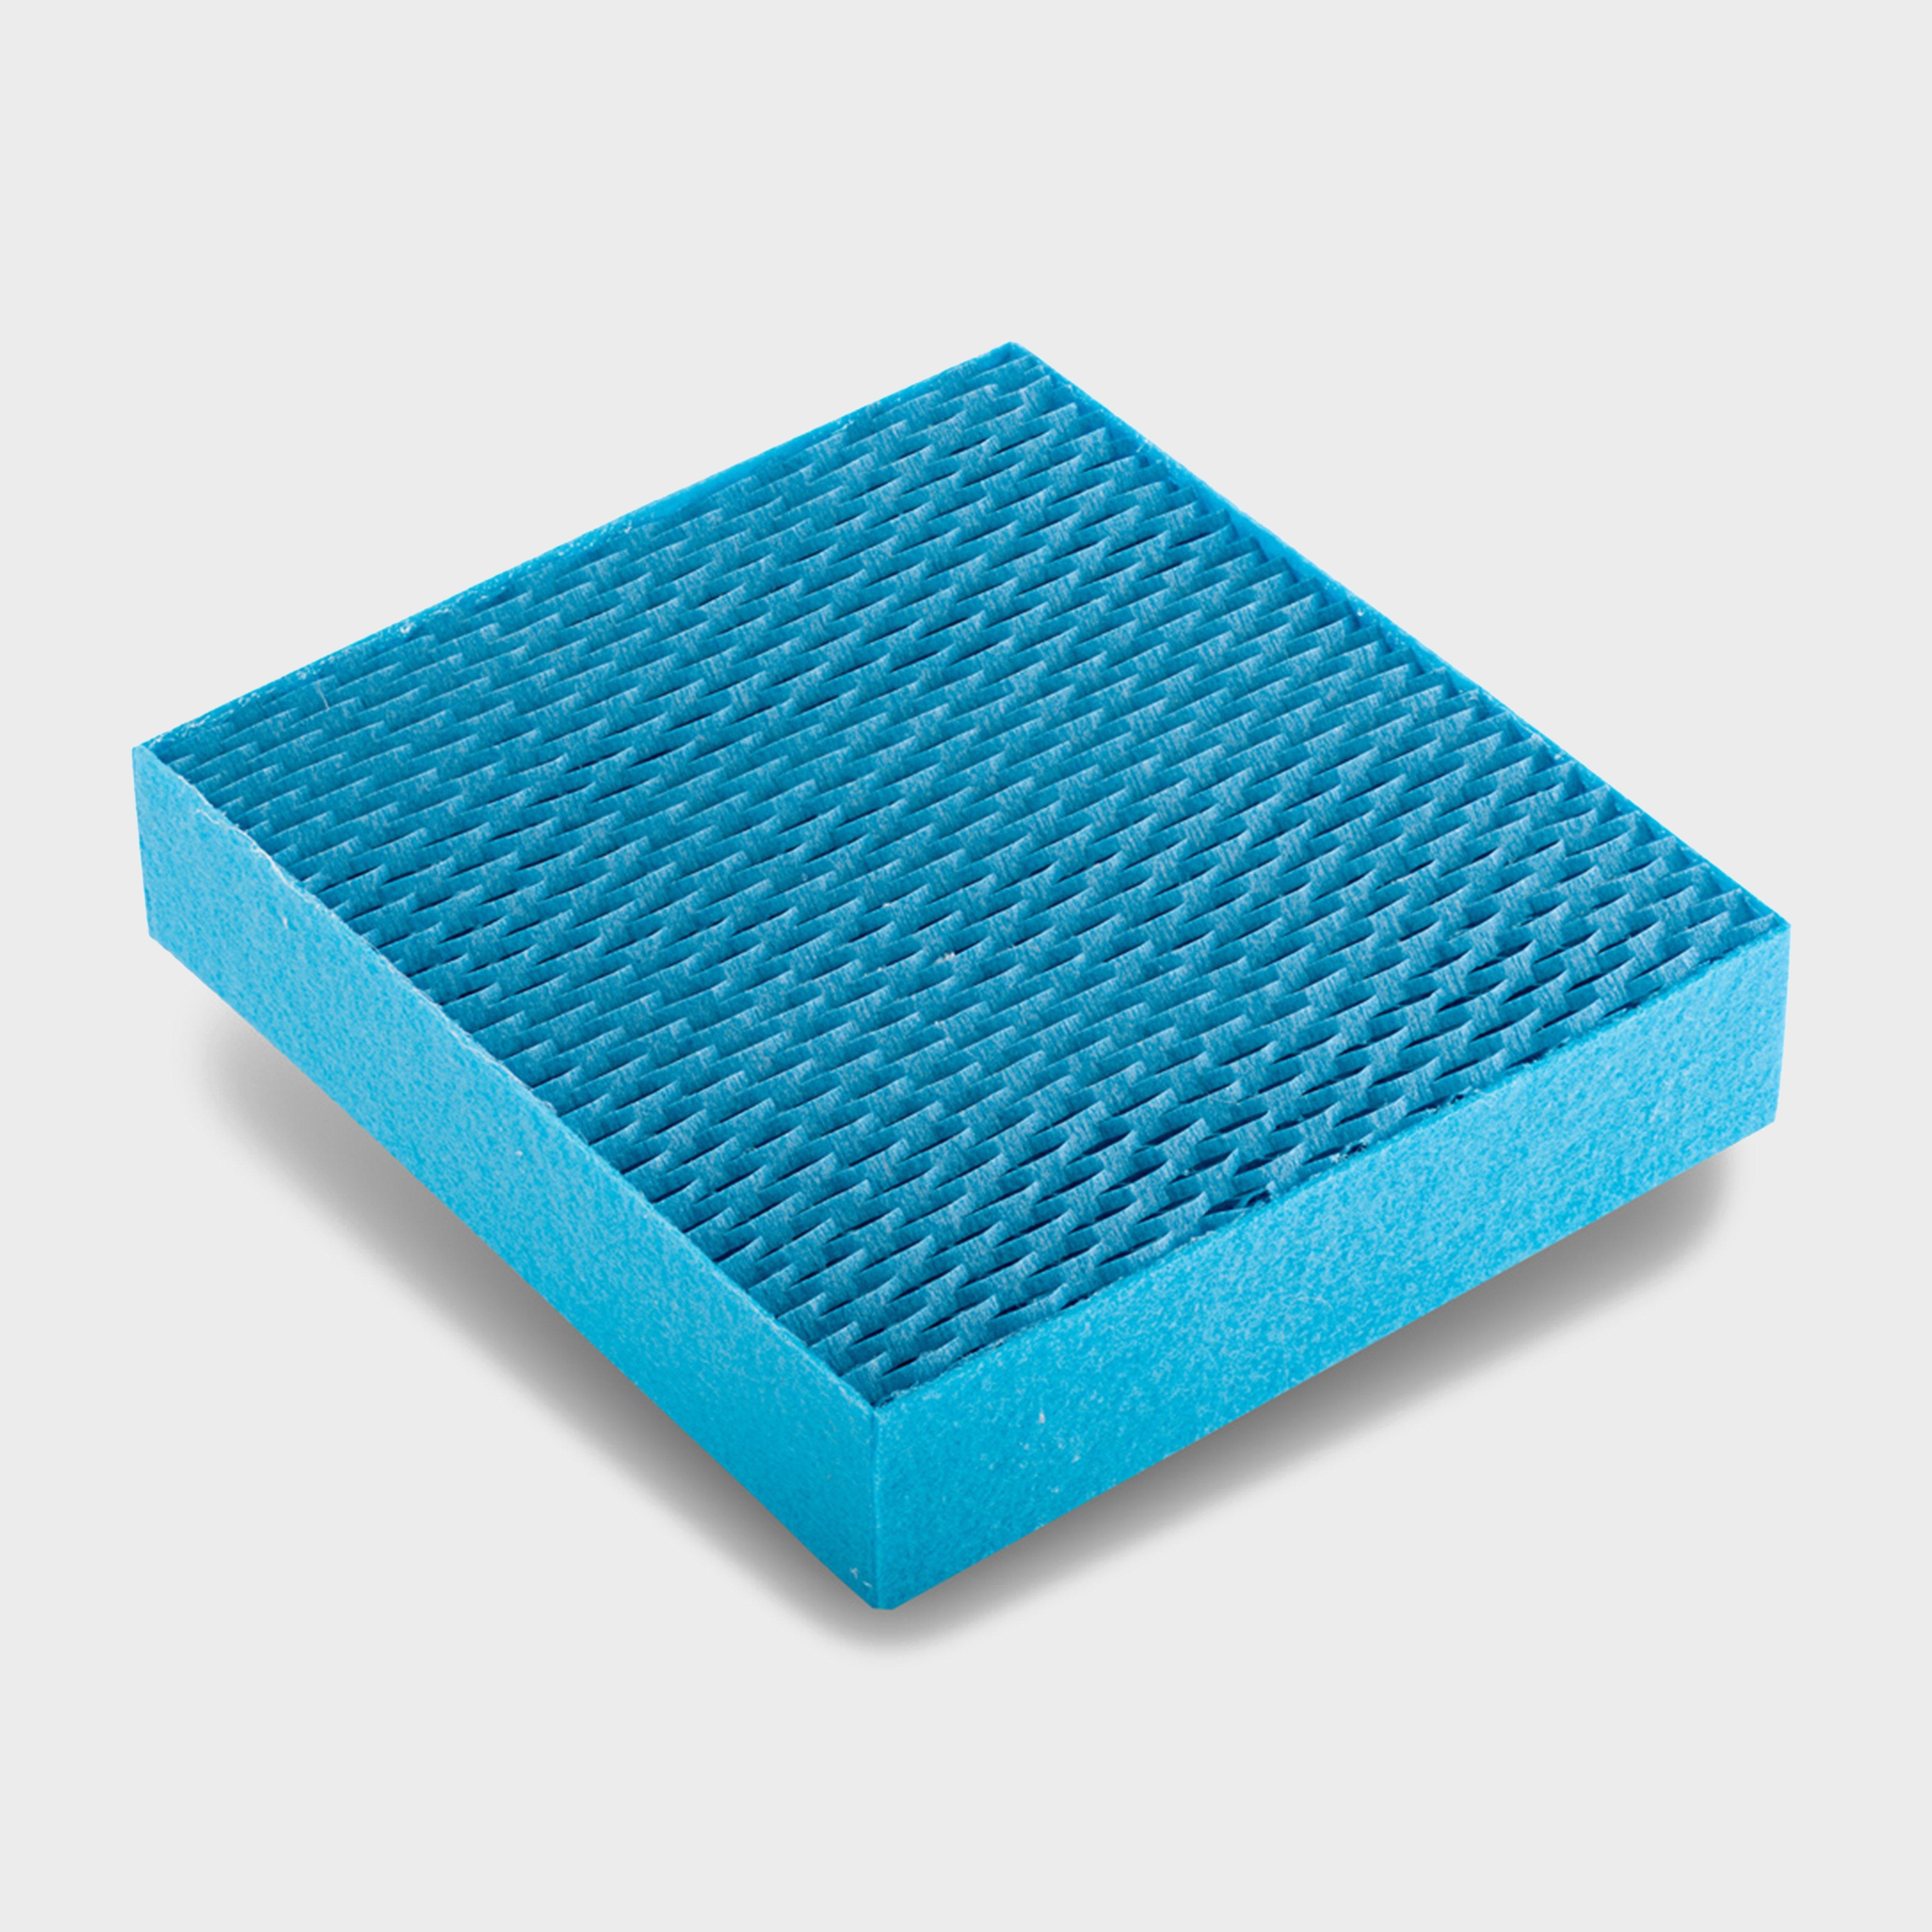 Totalcool Replacement Evaporative Cooling Pad Set - Blu/Blu, Blue